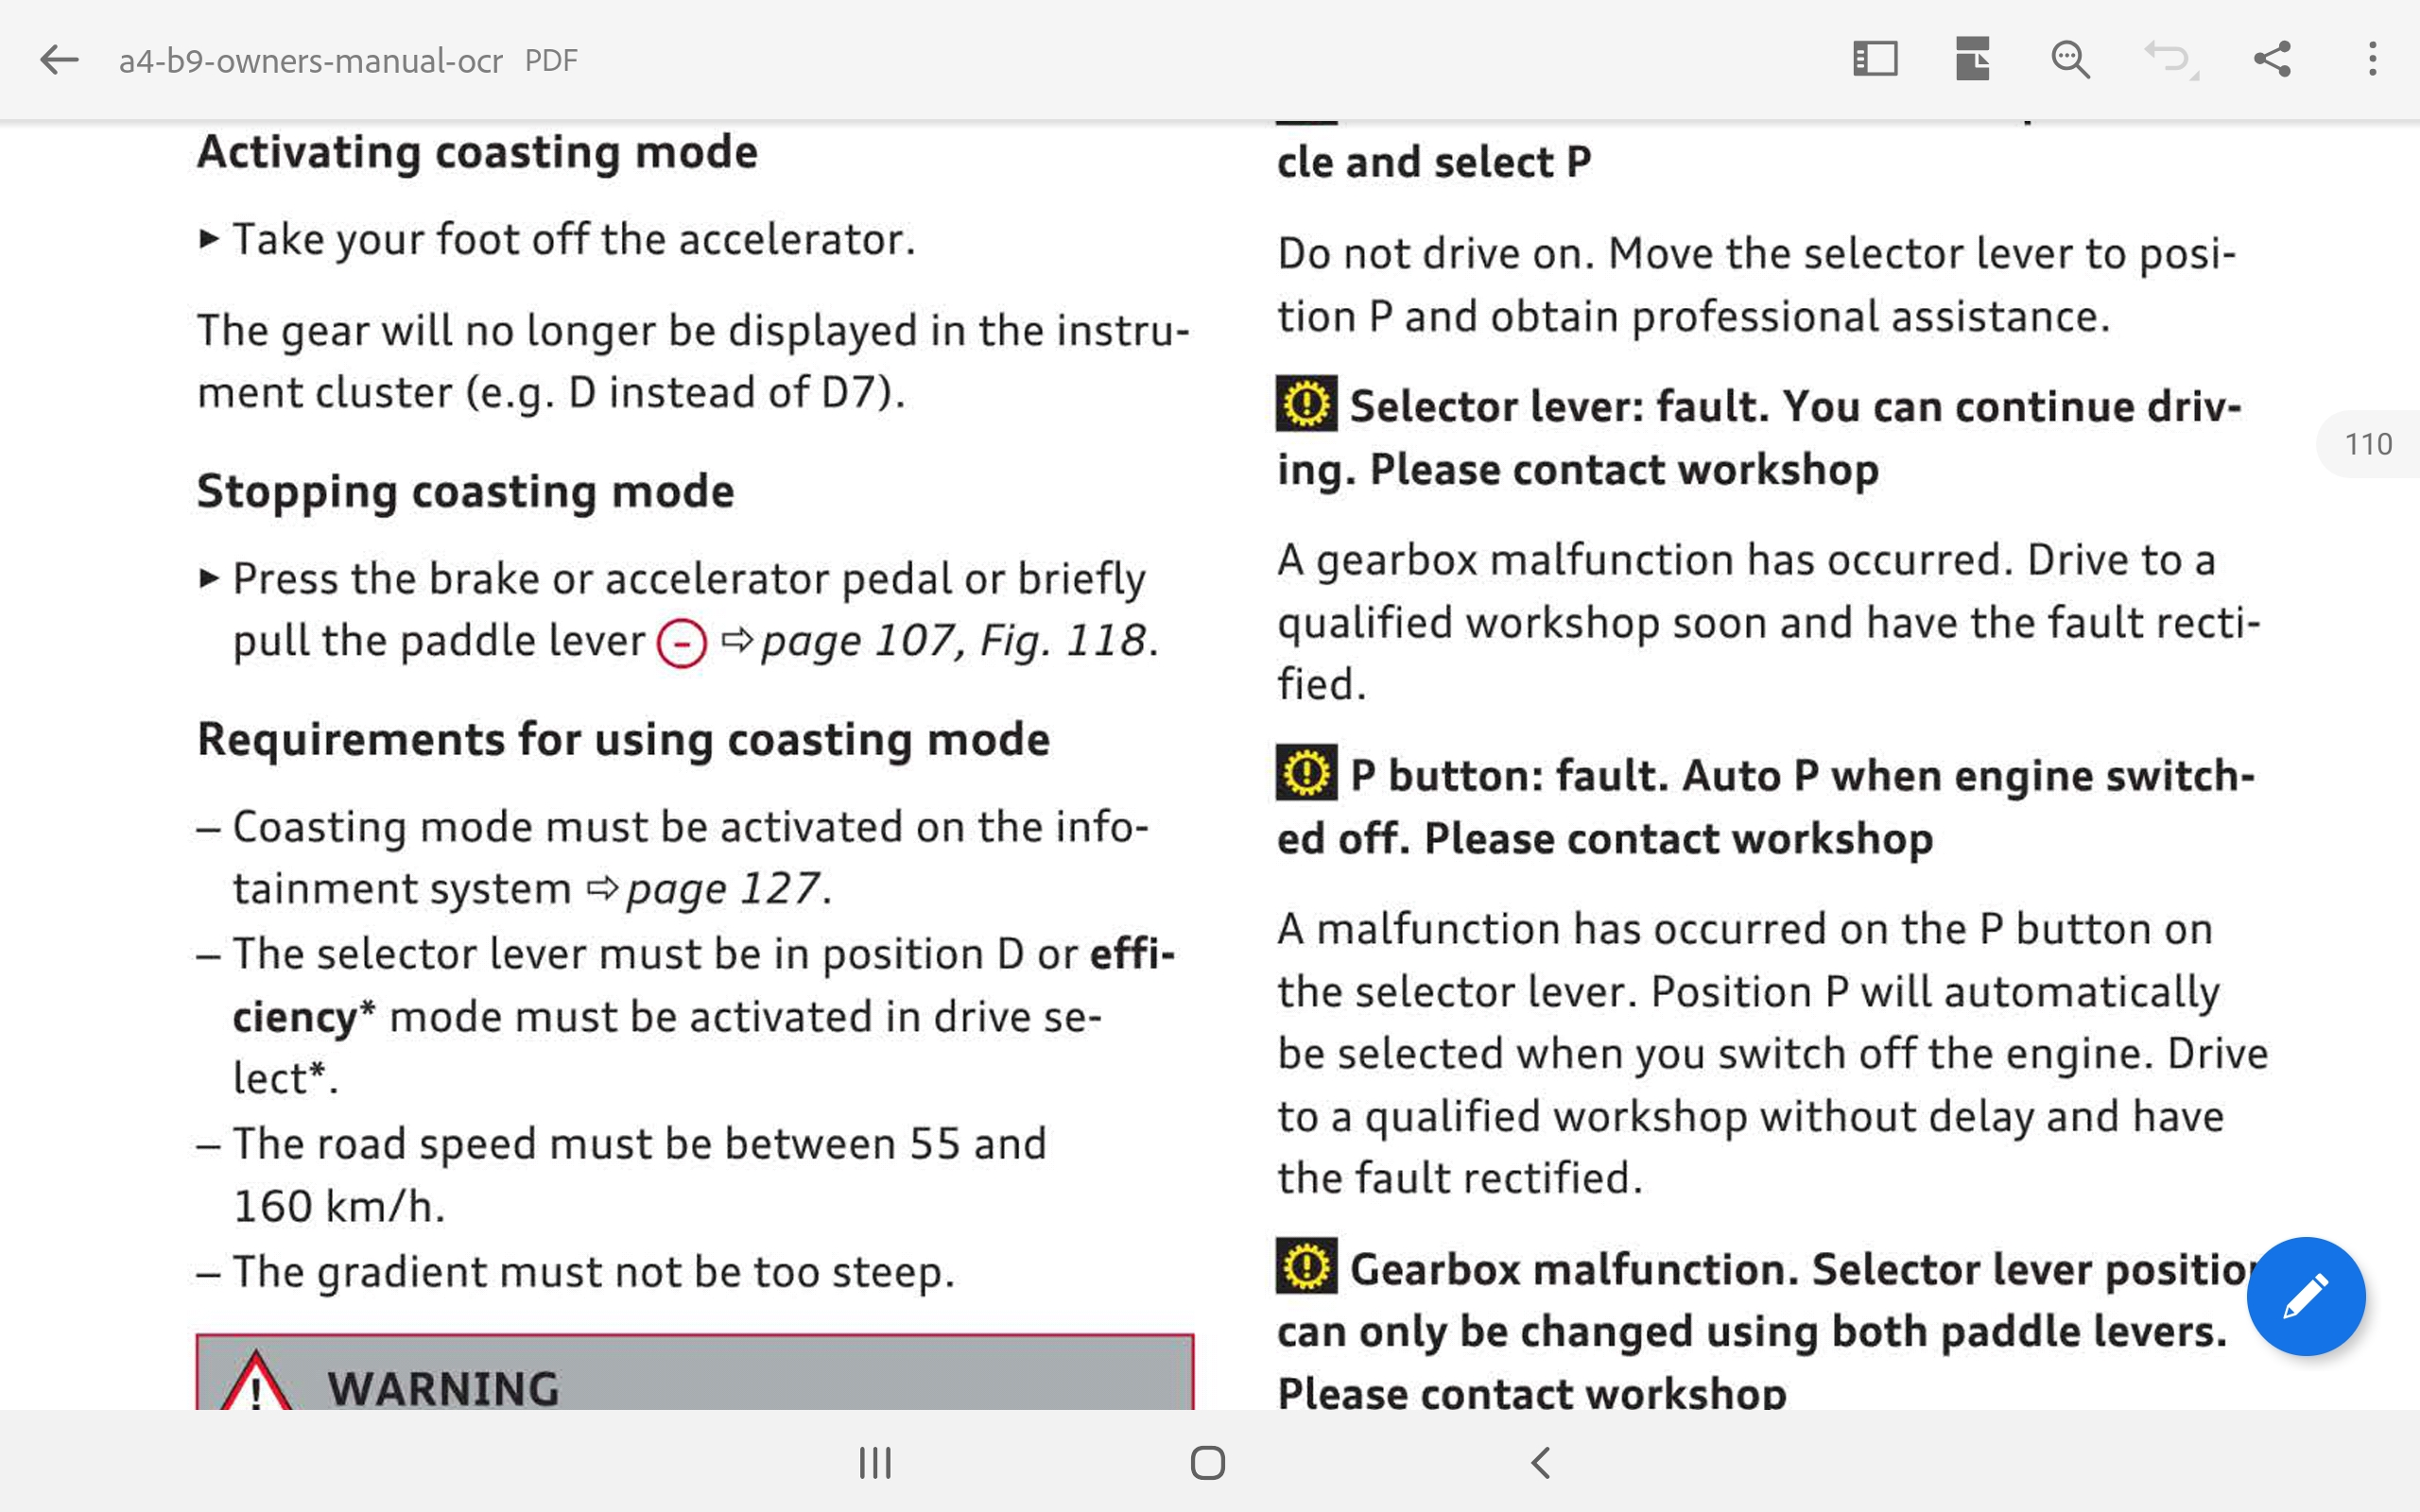 Screenshot_20200307-091436_Adobe Acrobat.jpg